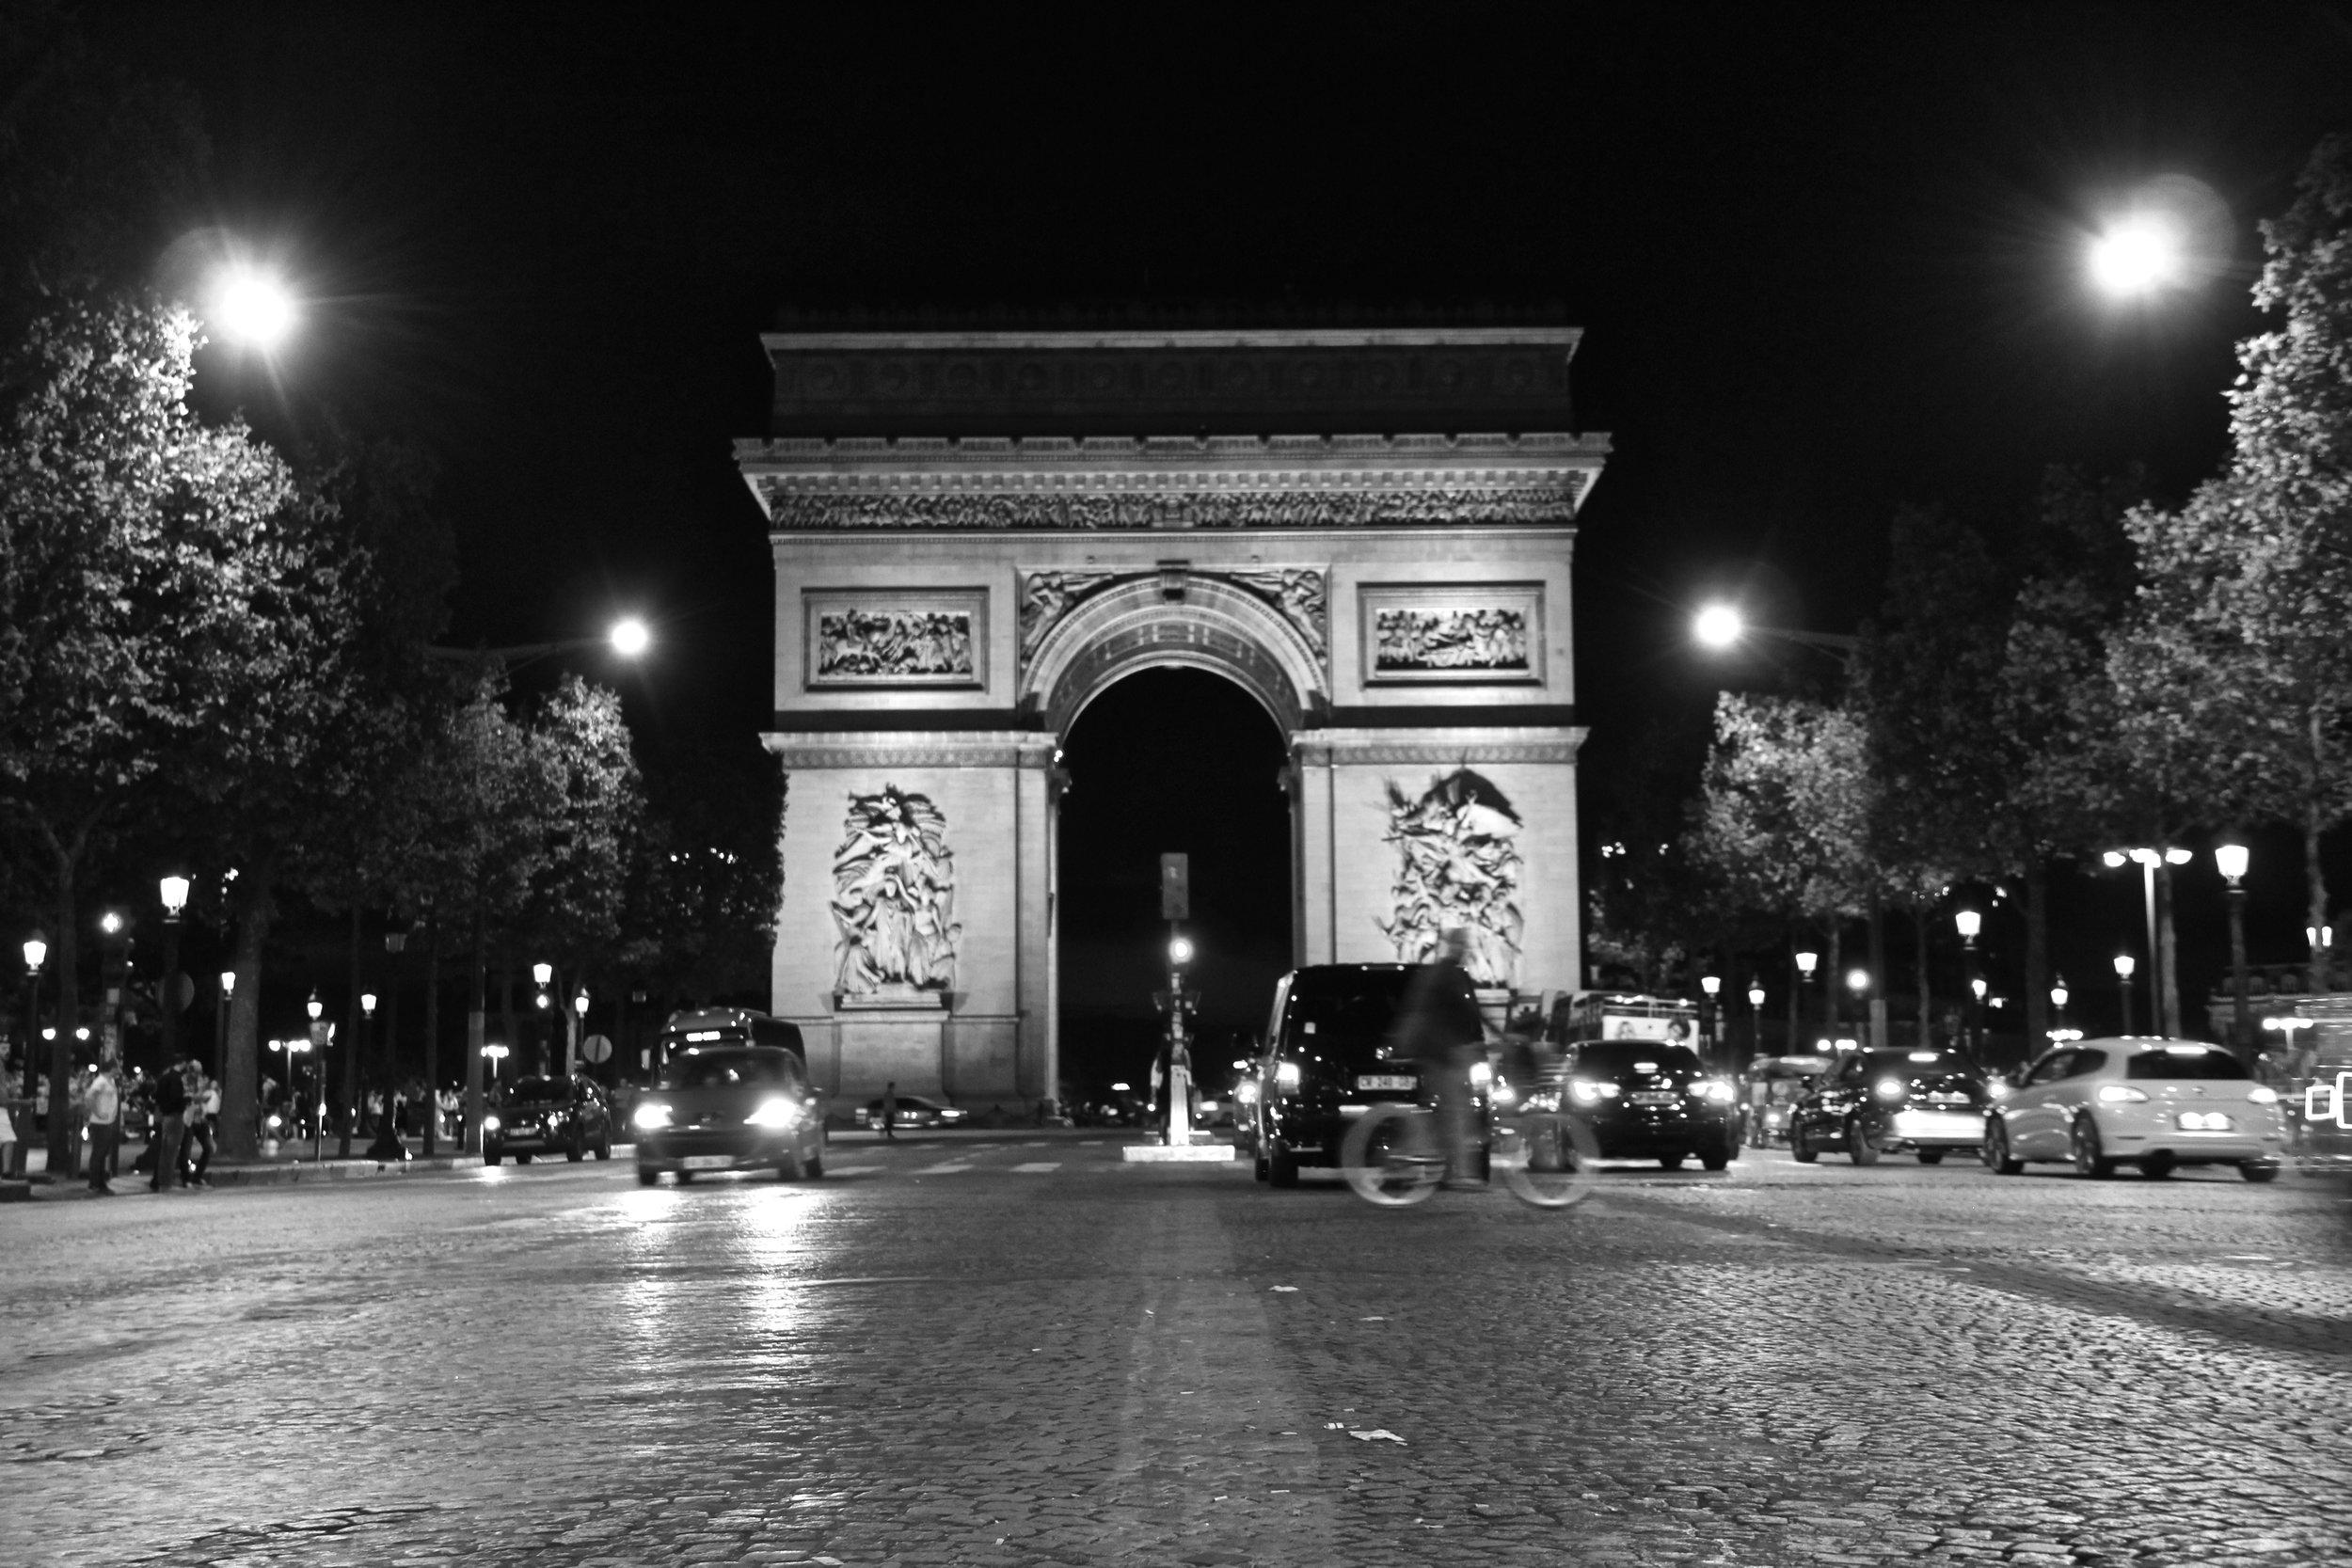 2016.09 Paris Edited 8488.jpg